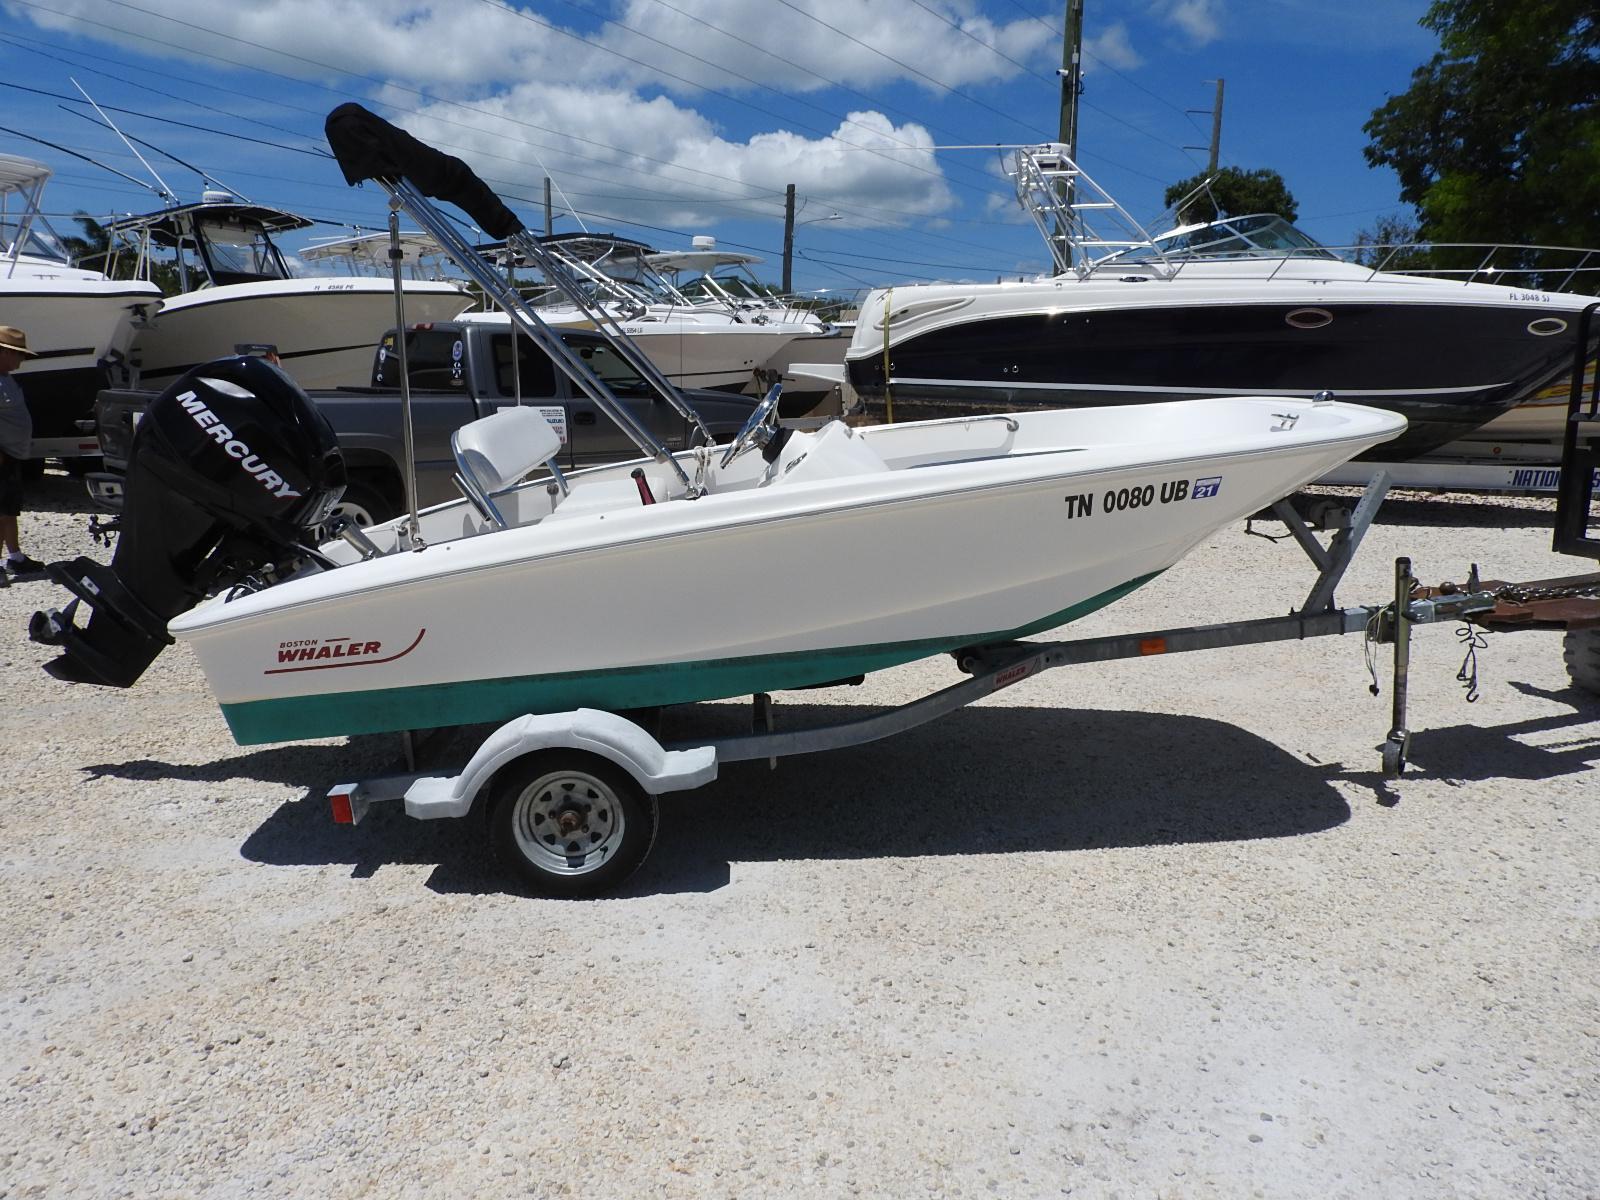 Inventory Nations Best Boats Key Largo, FL (305) 451-2500